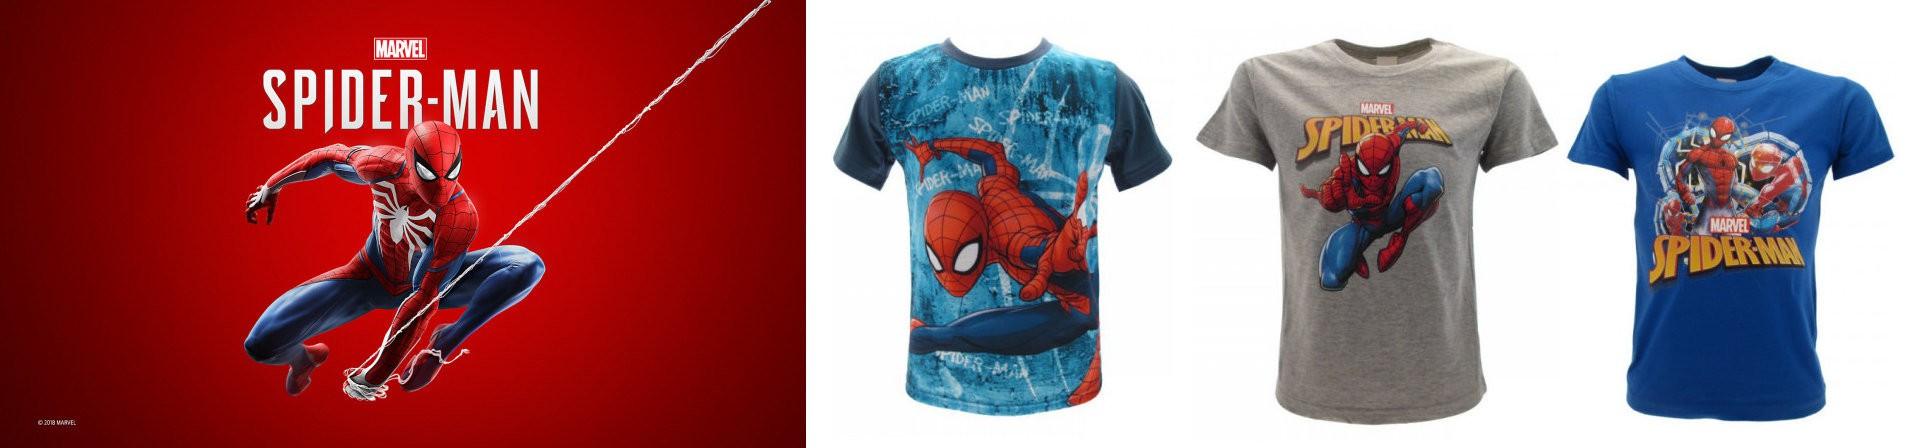 vendita online t-shirt Spiderman acquista online MARVEL